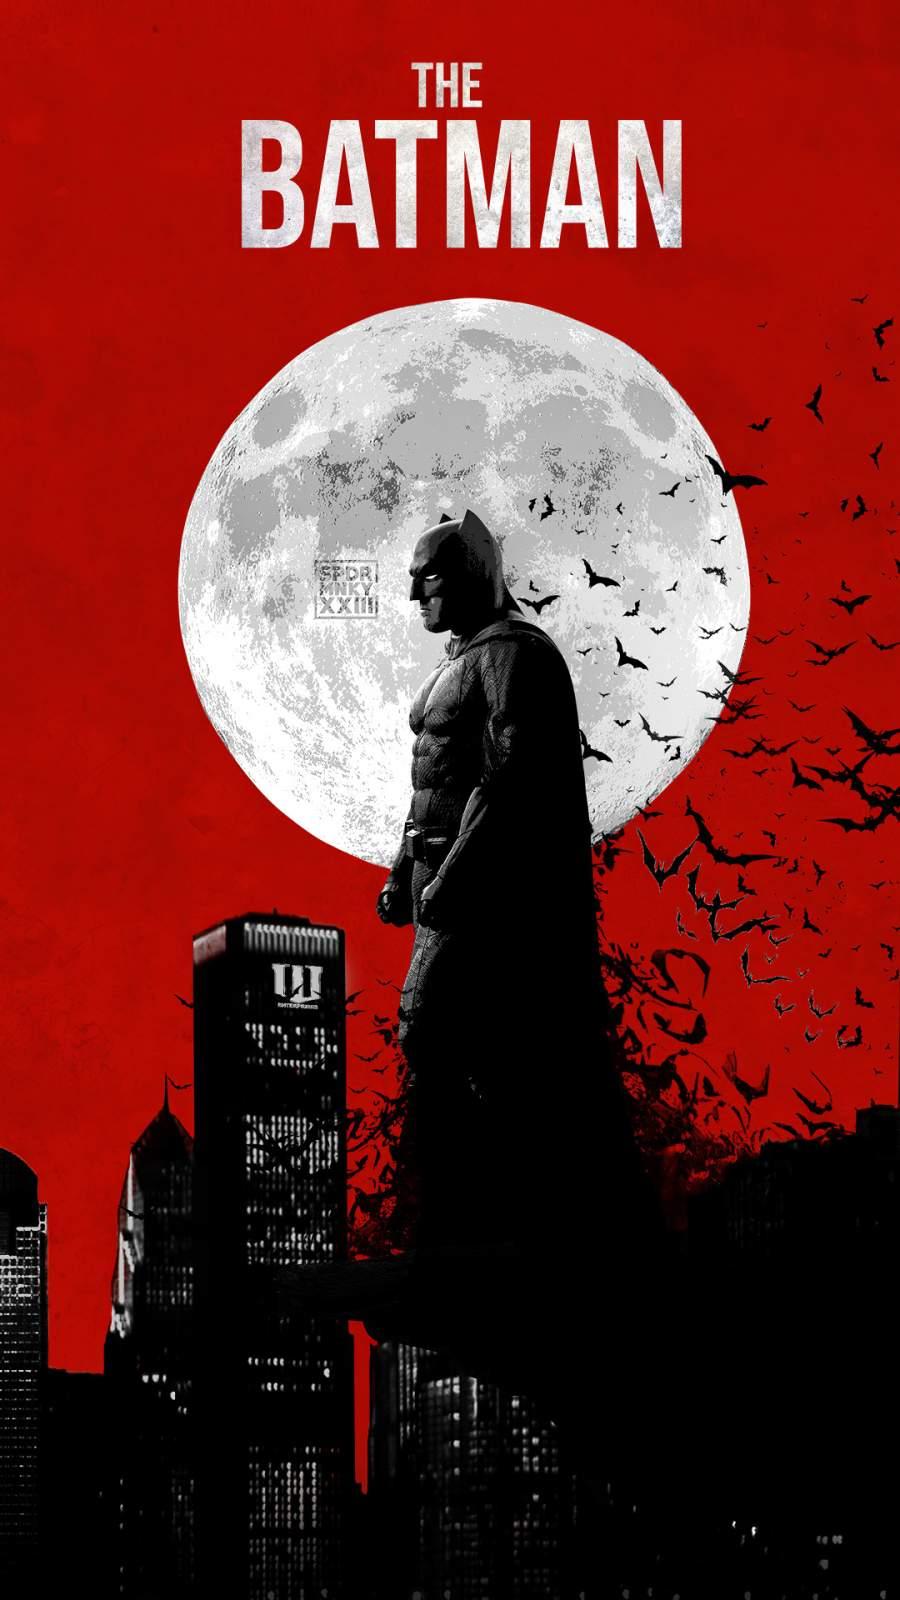 The Batman 4k iPhone Wallpaper